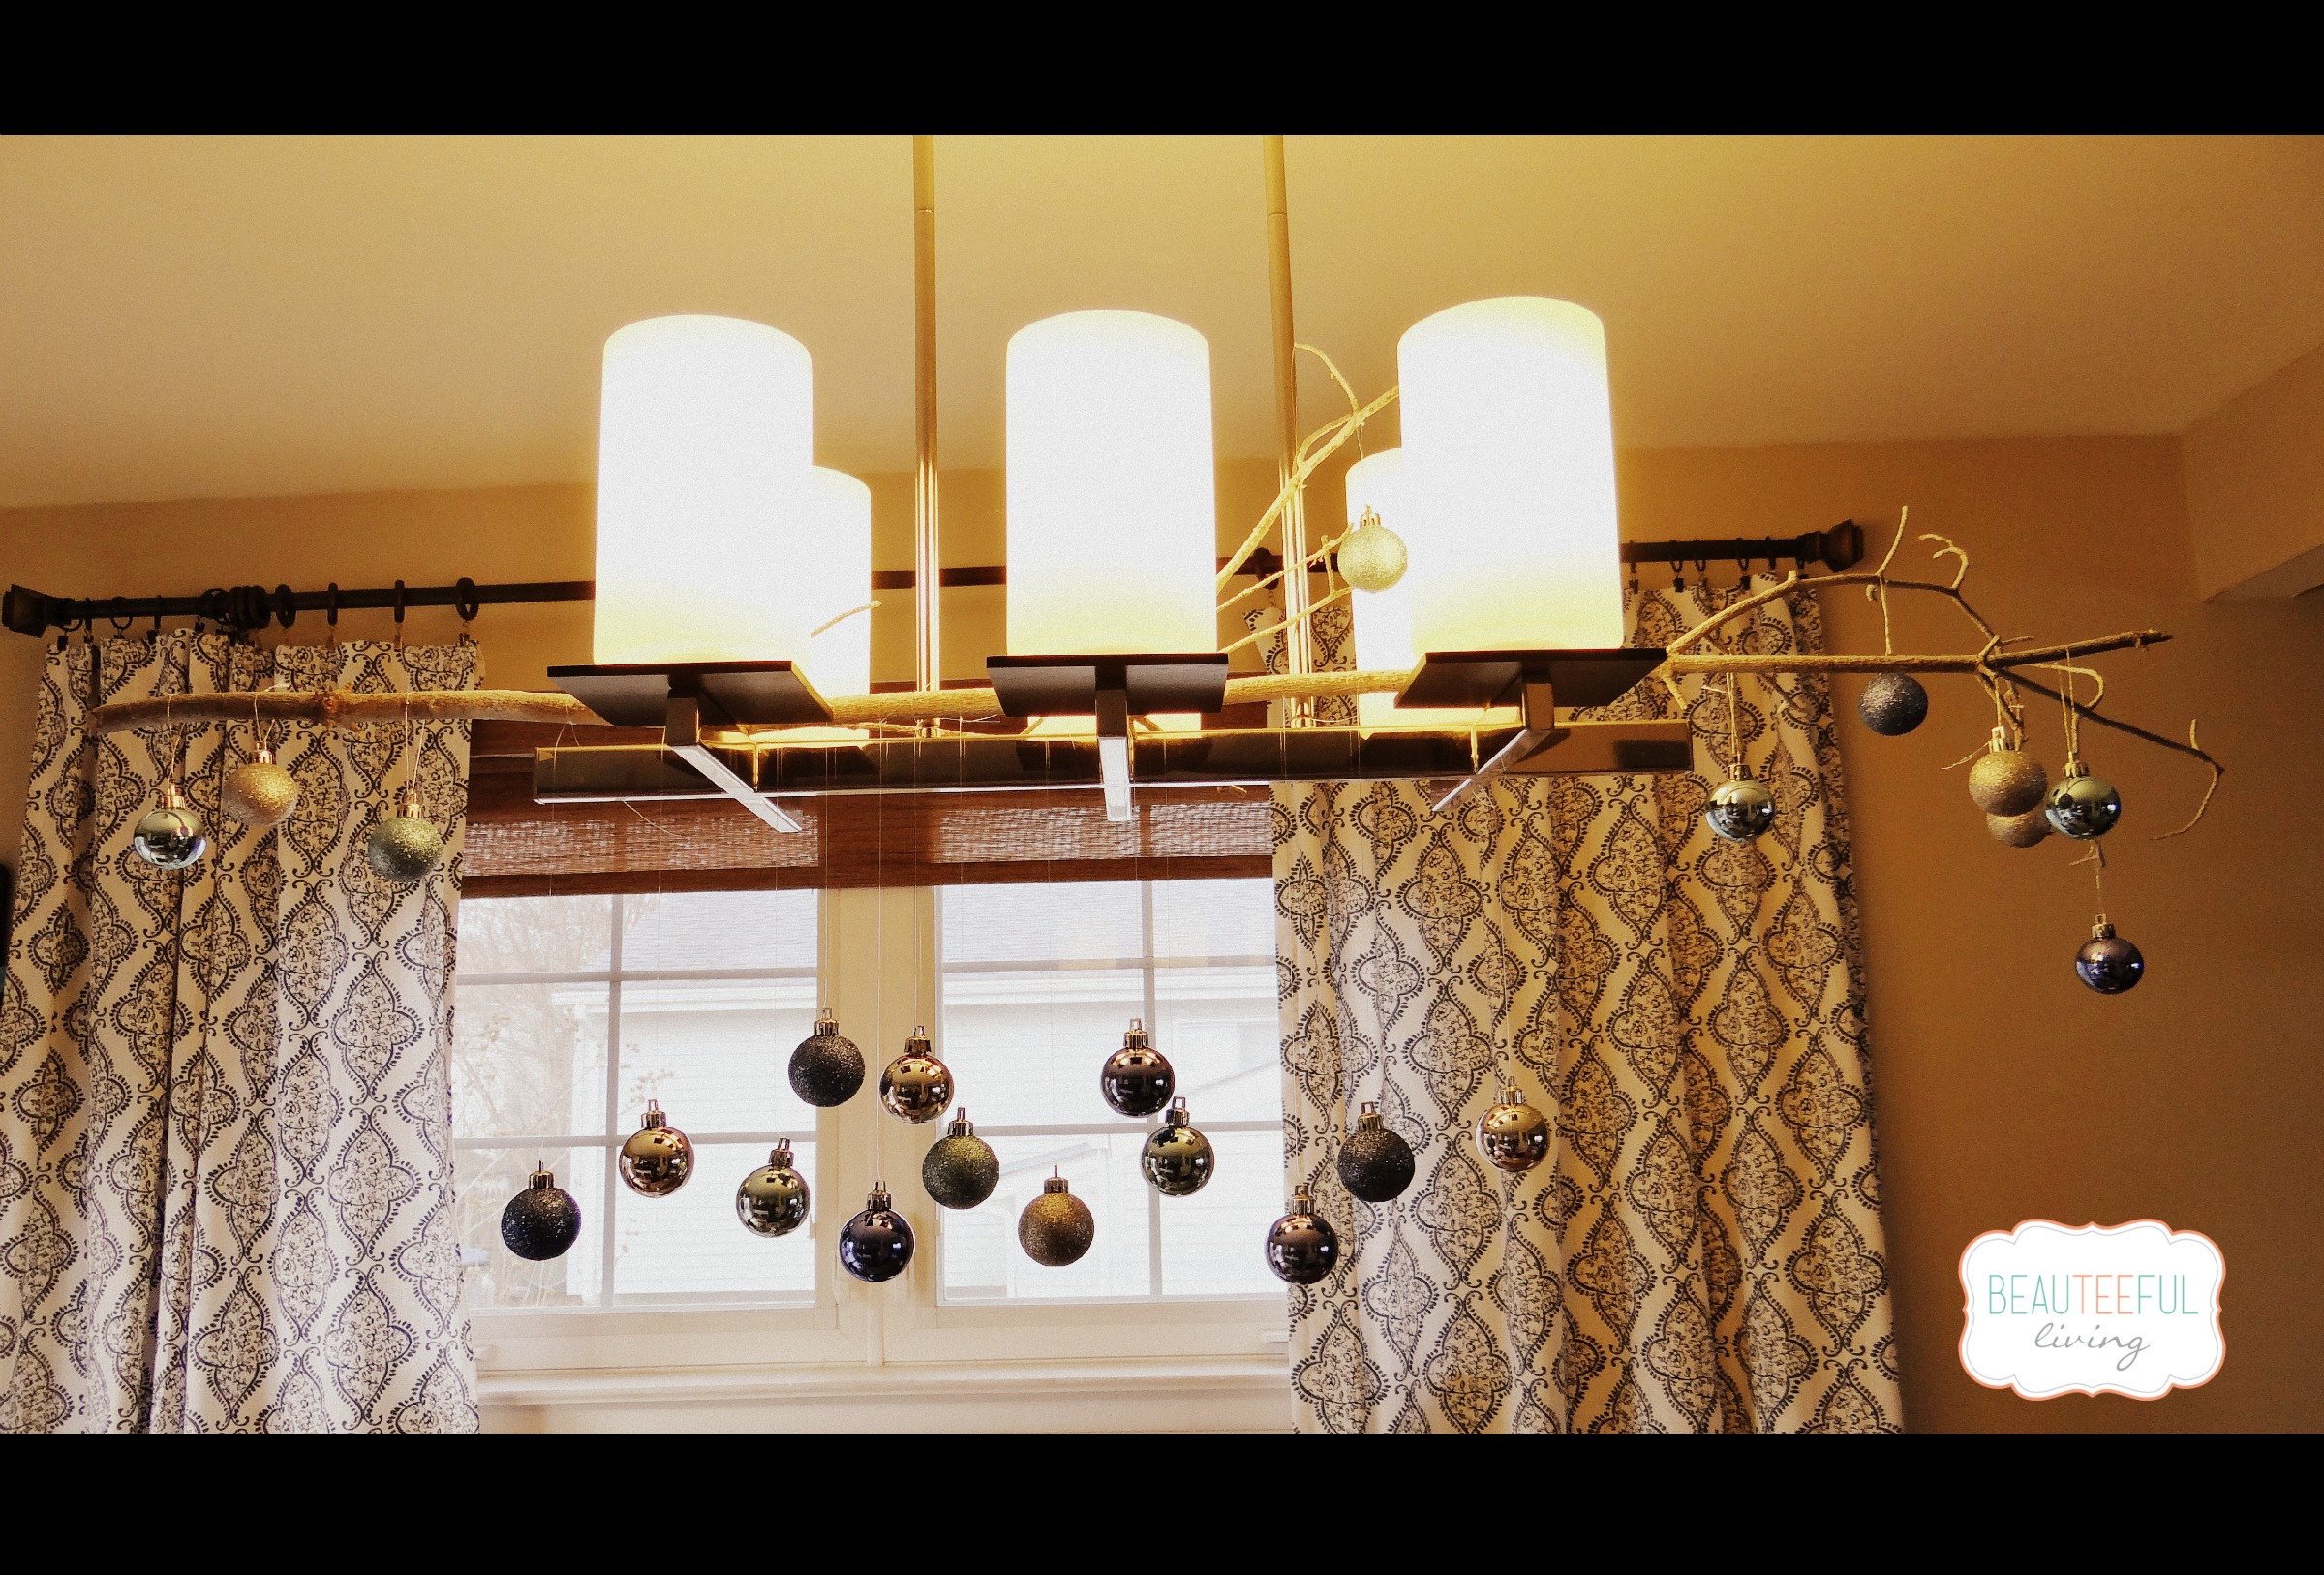 Diy ornament chandelier beauteeful living ormament chandelier diy mozeypictures Image collections